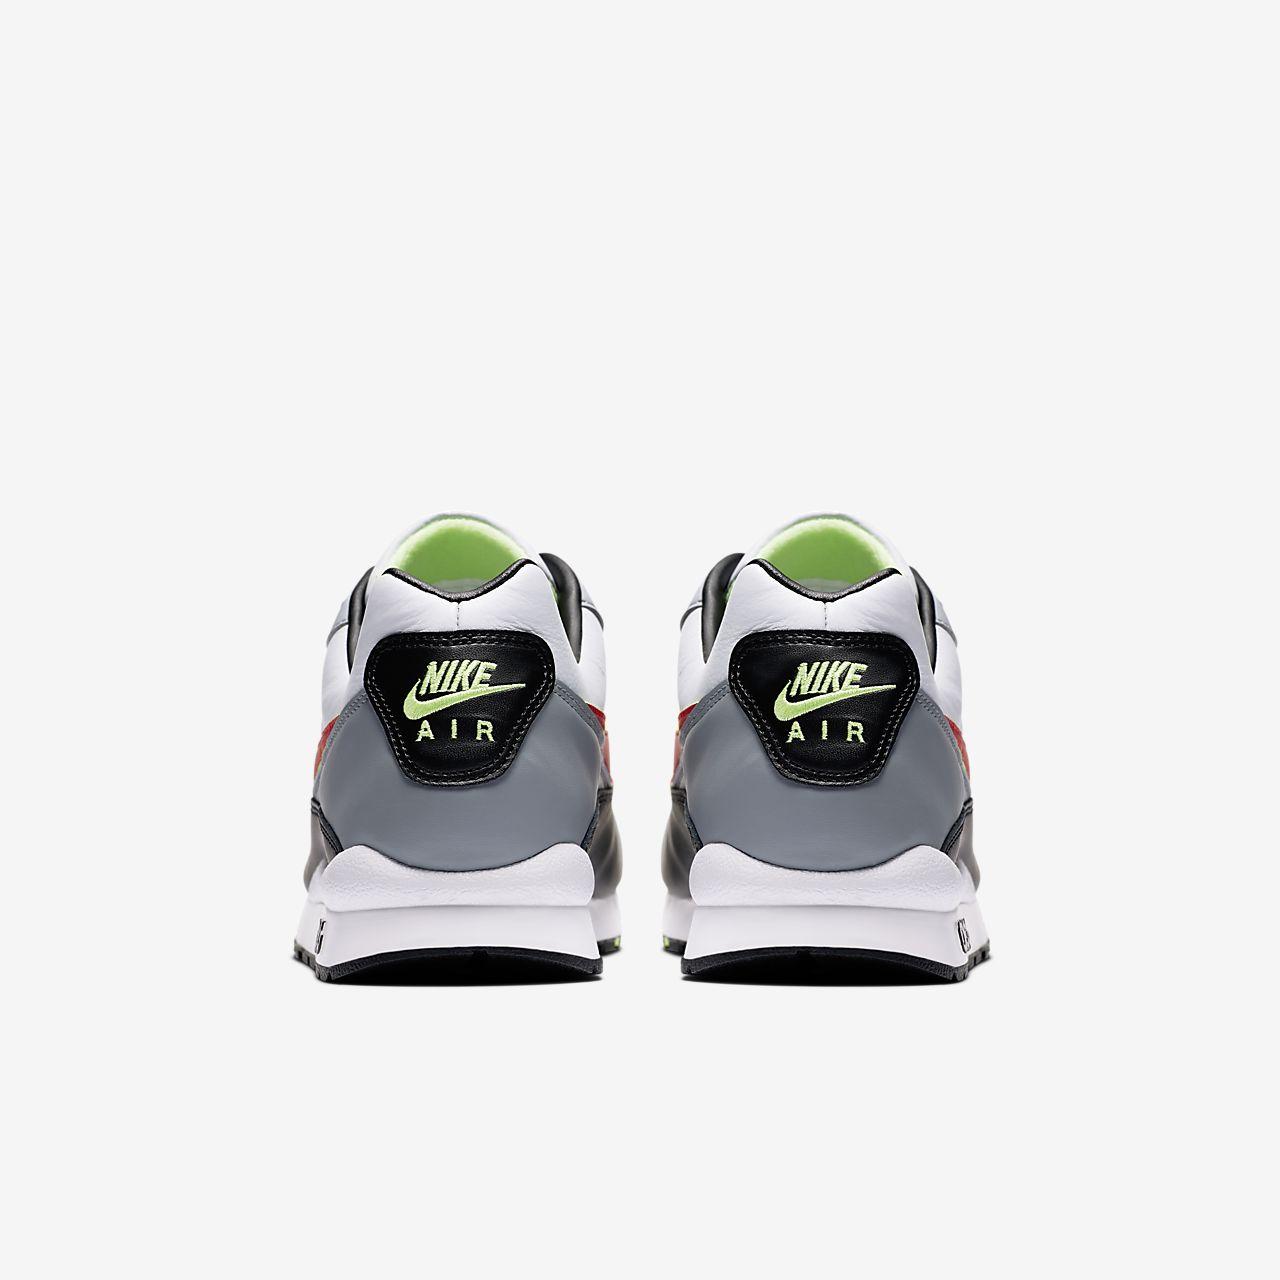 promo code d7d2e c6715 ... Chaussure Nike Air Wildwood ACG pour Homme